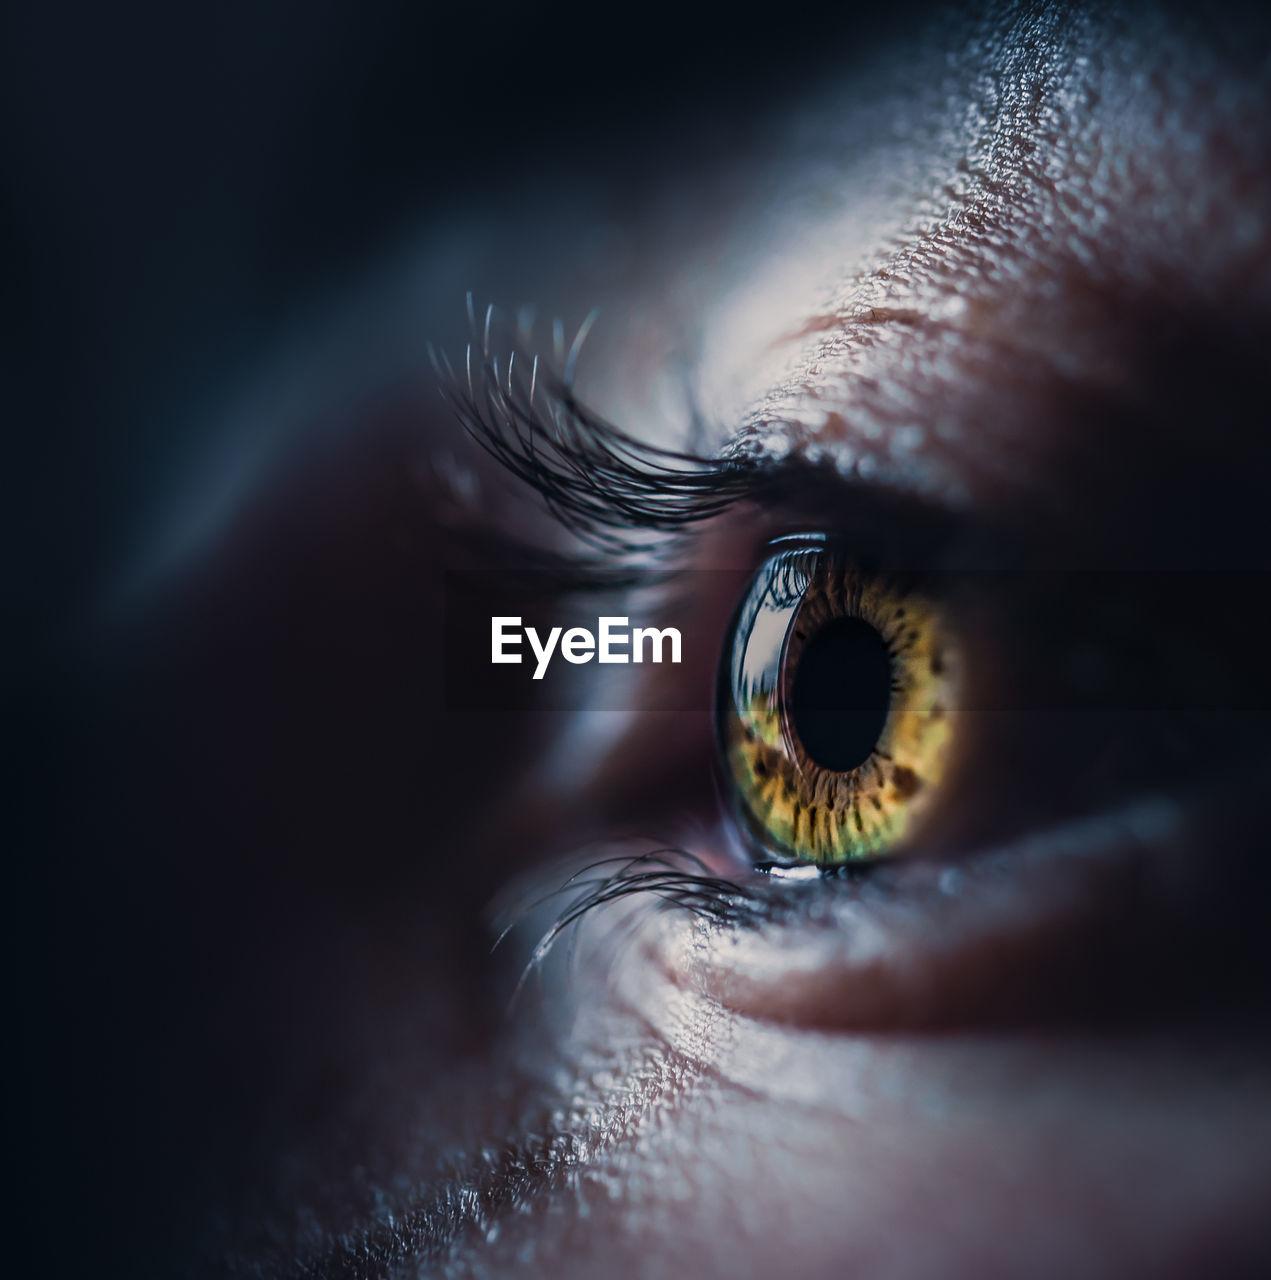 Close-up of human eye looking away